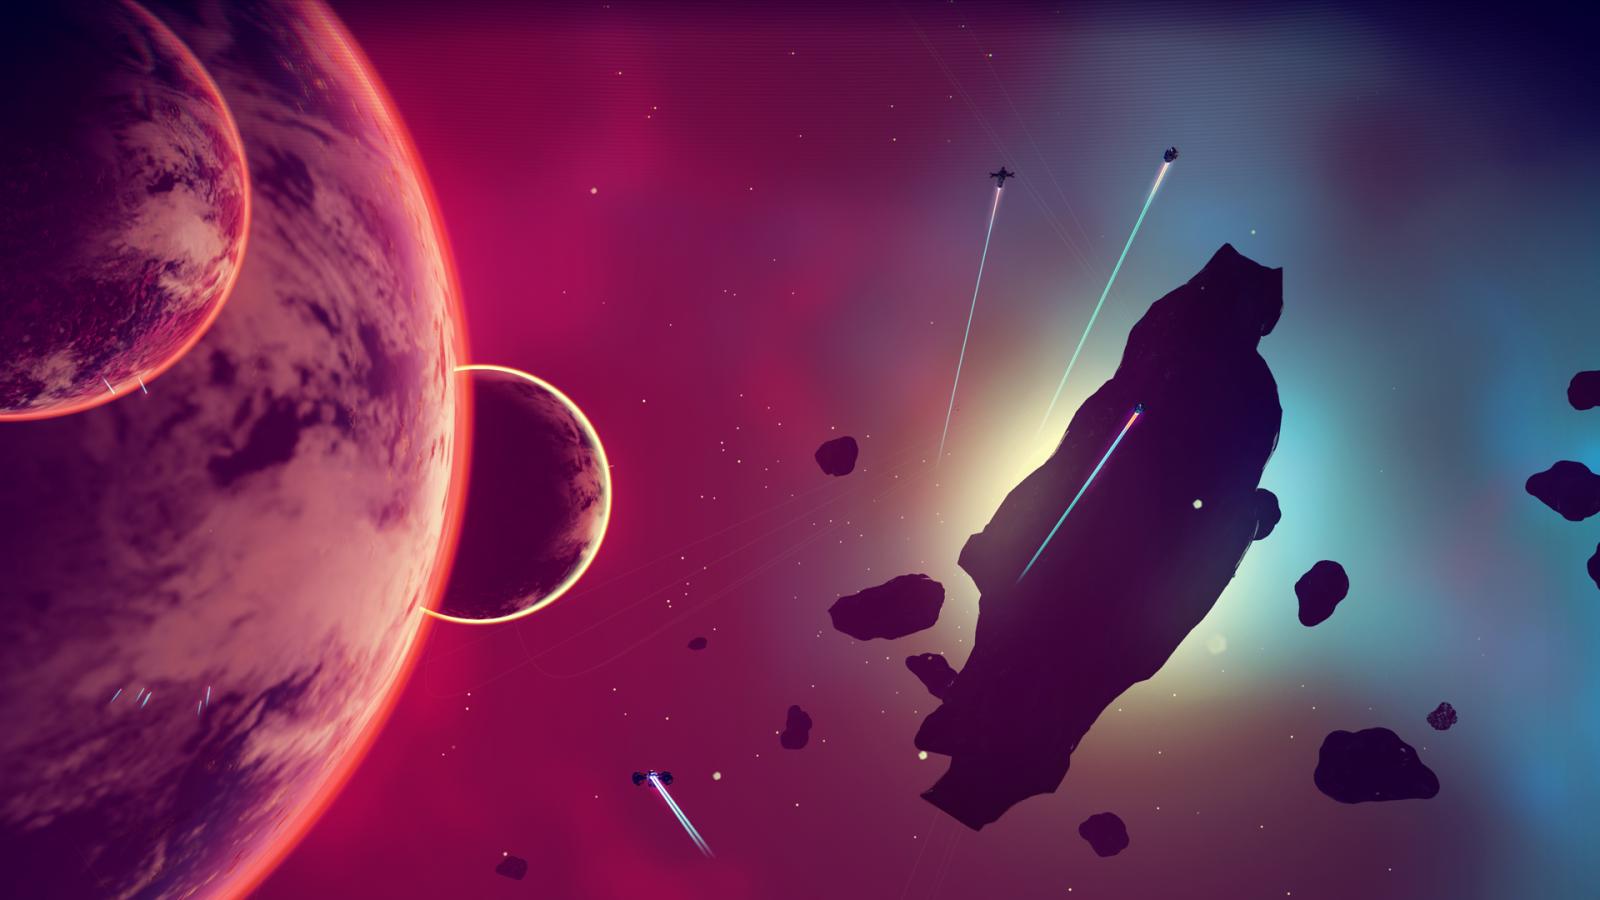 No Man's Sky screenshot space